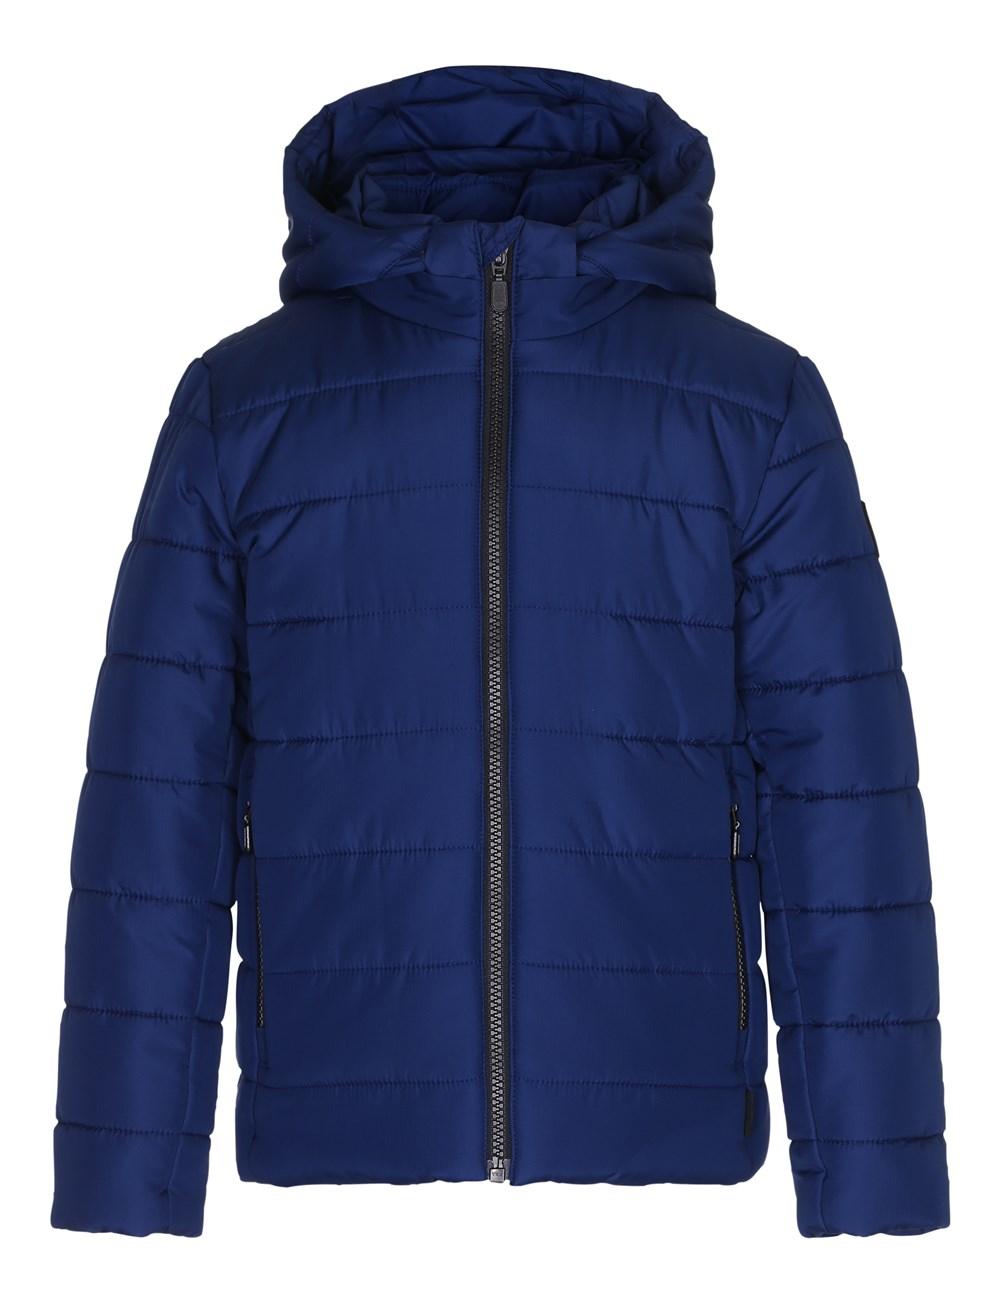 Howl - Estate Blue - Blue jacket with star reflector